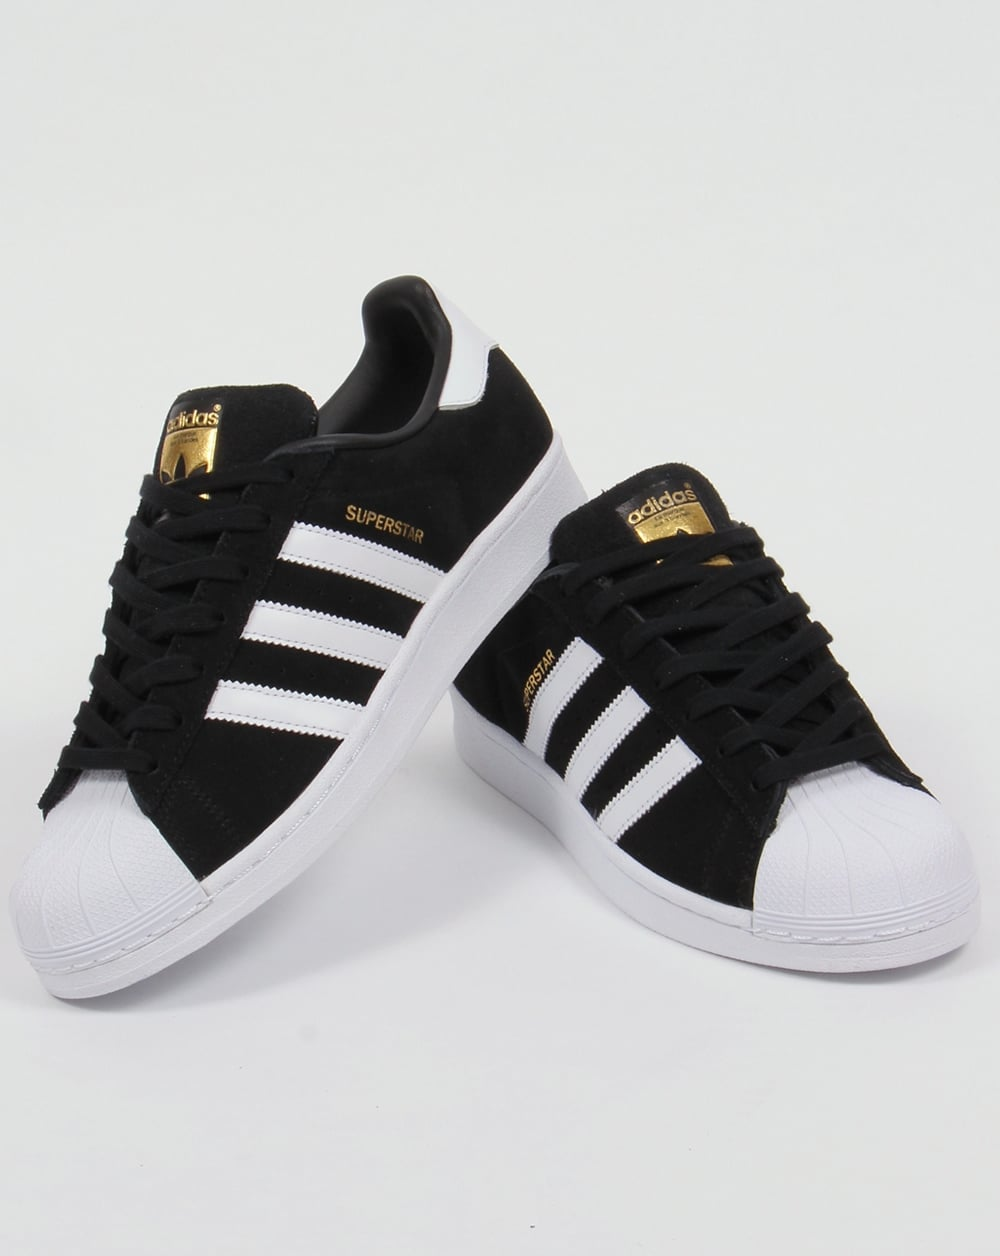 black adidas superstar trainers